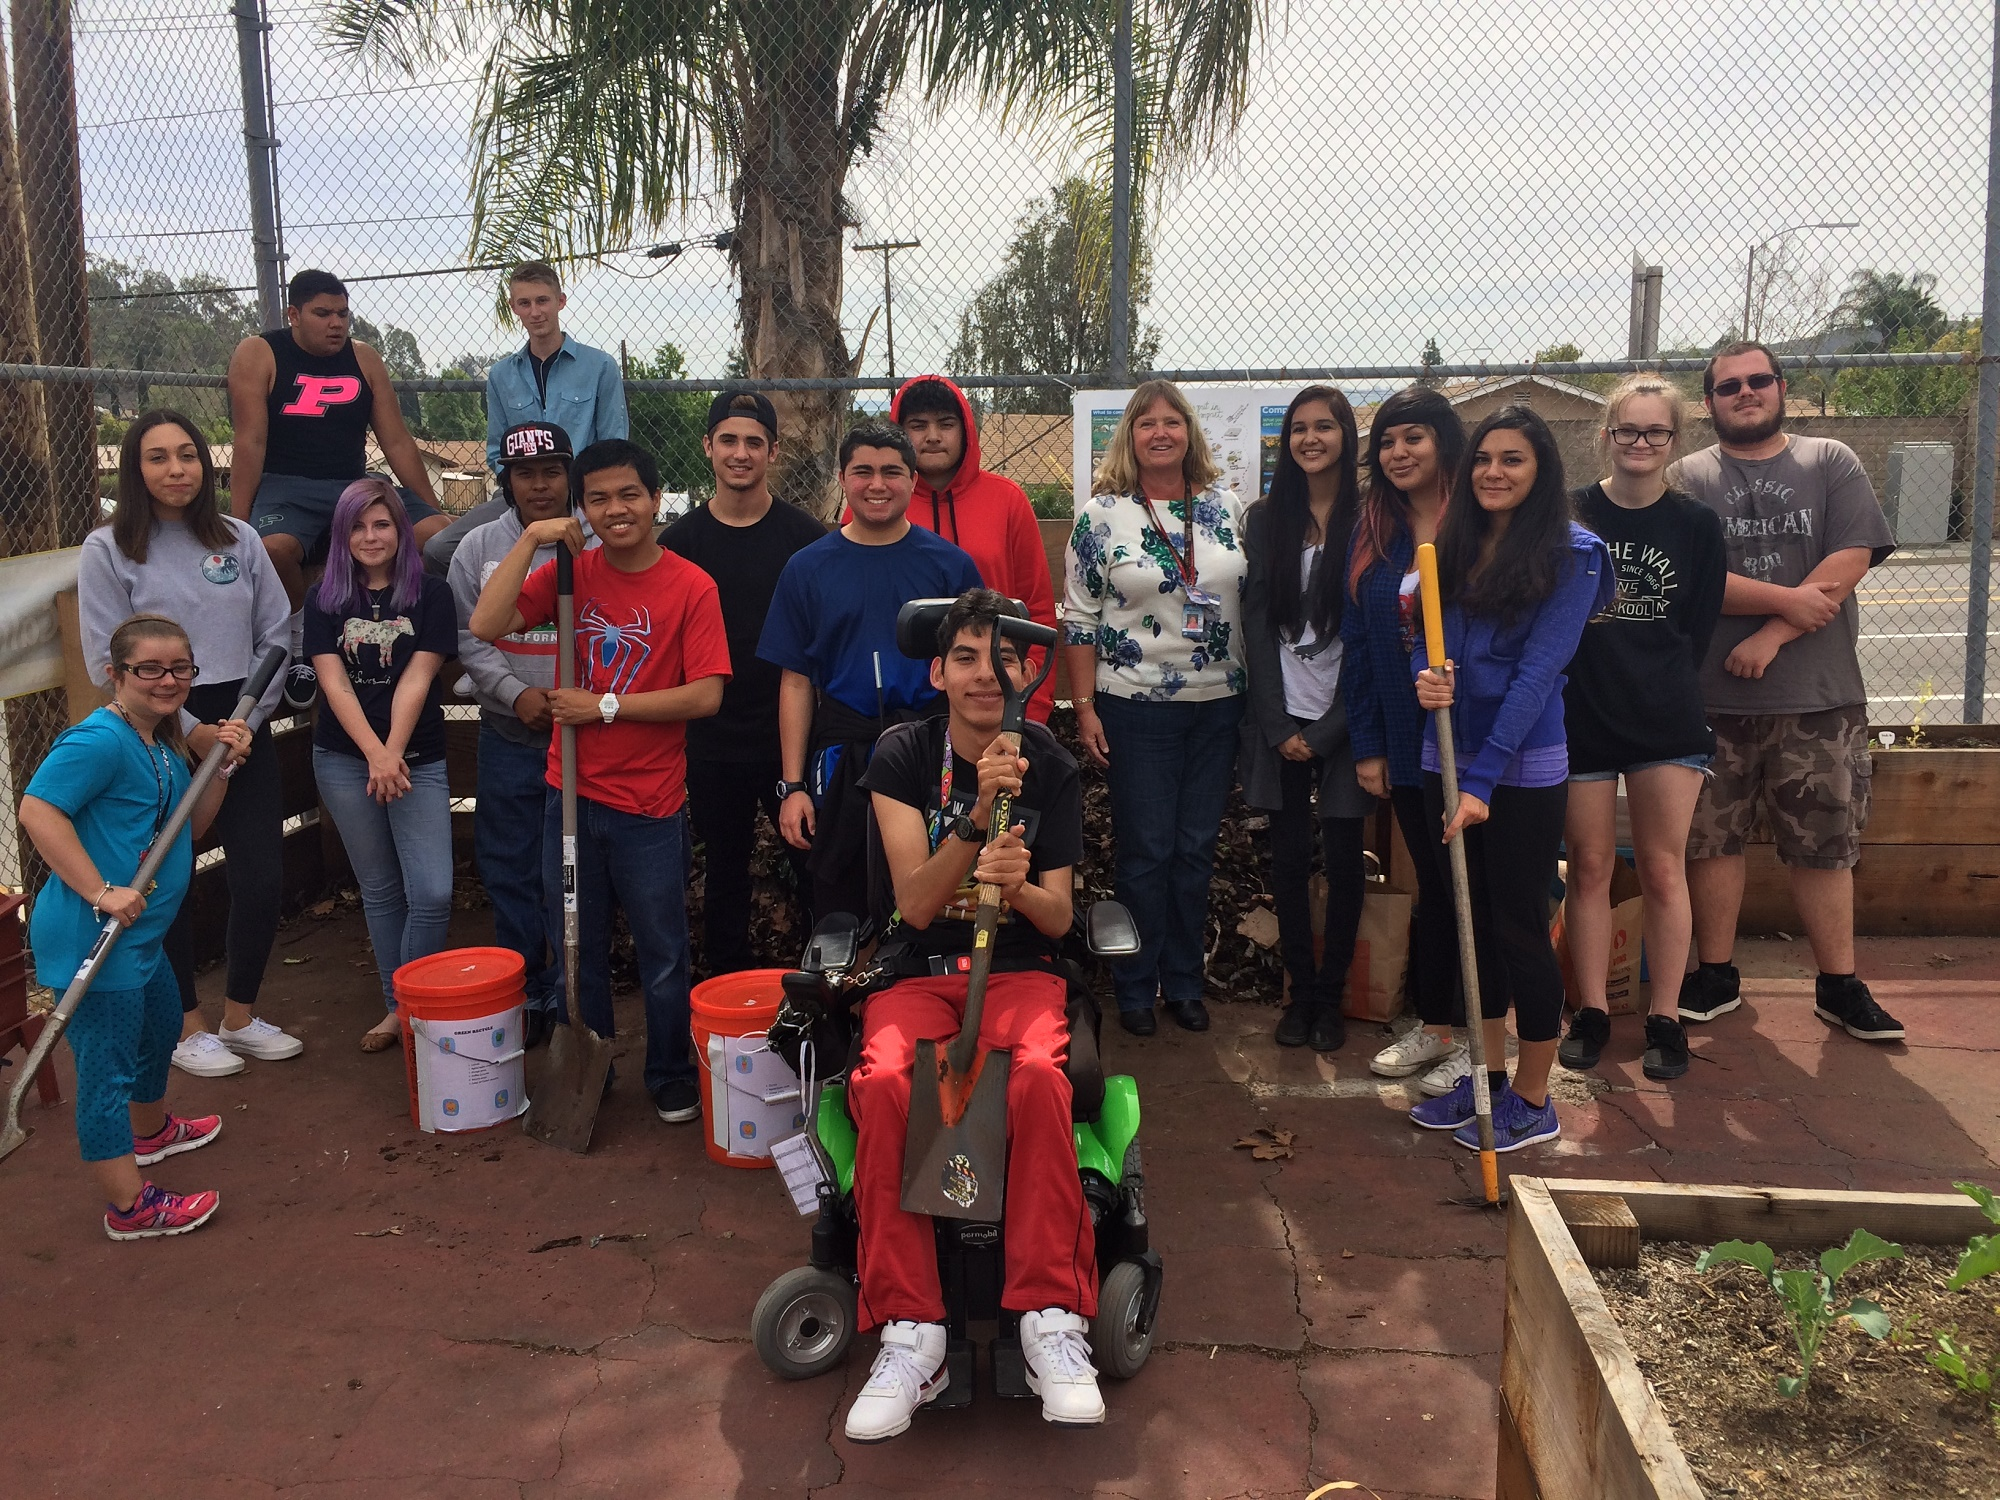 The Compost Crew 2017